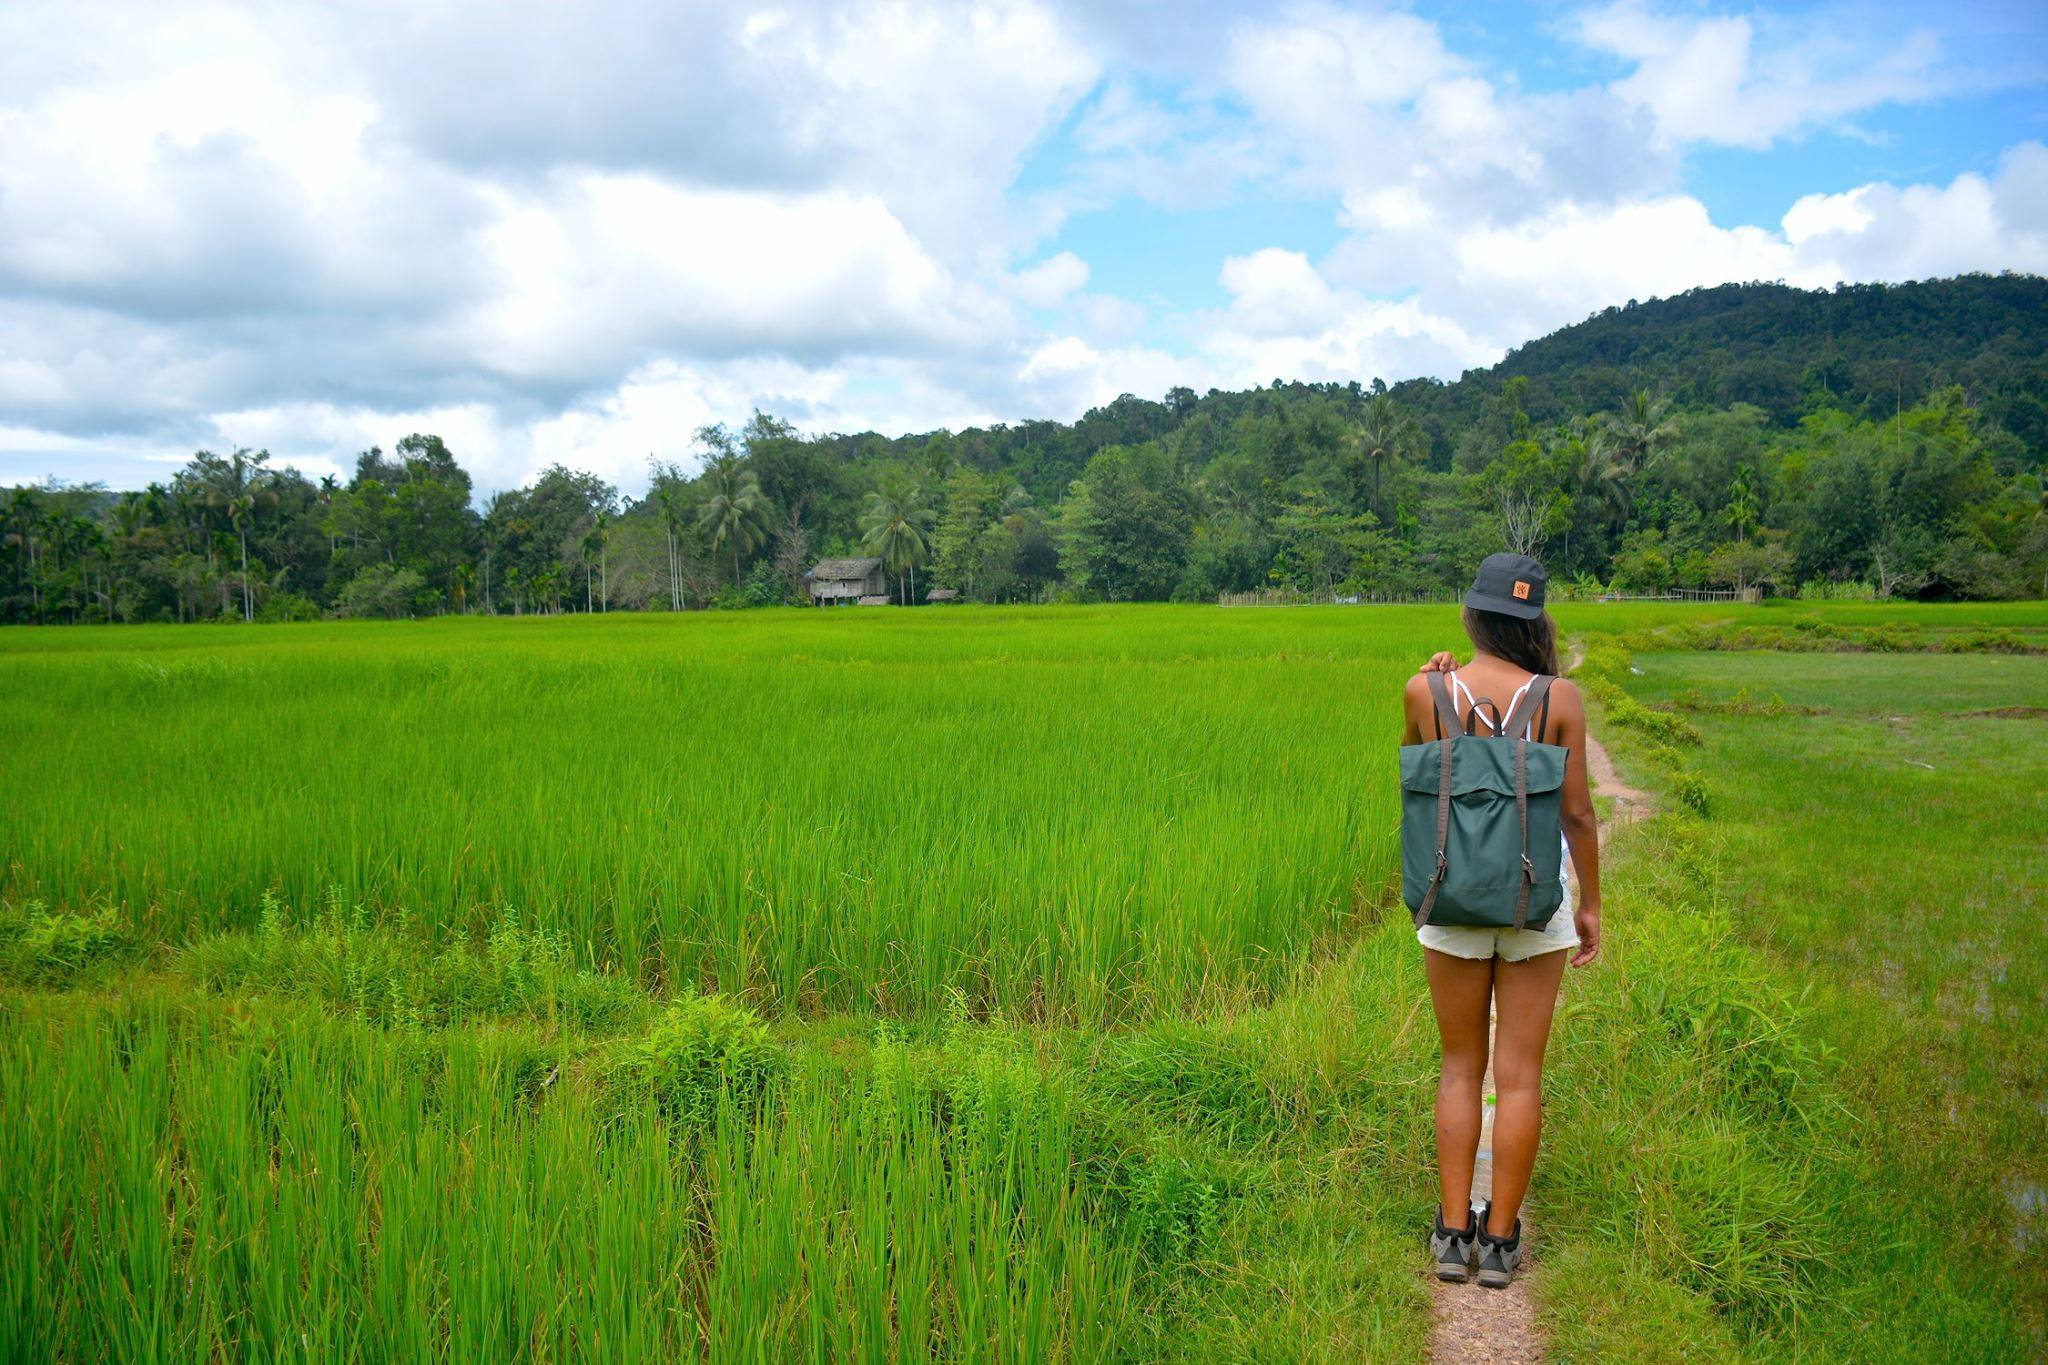 THISWORLDEXISTS Cambodia Travel Volunteer